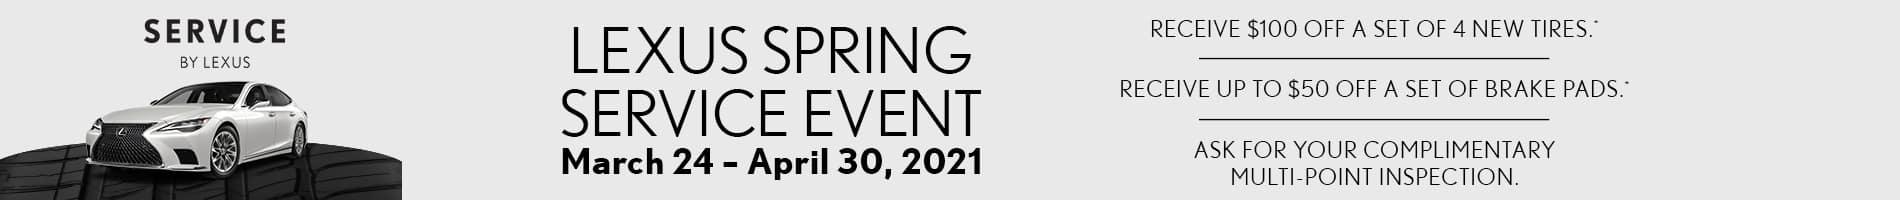 2021-03-25 Service PageTop_Desk2